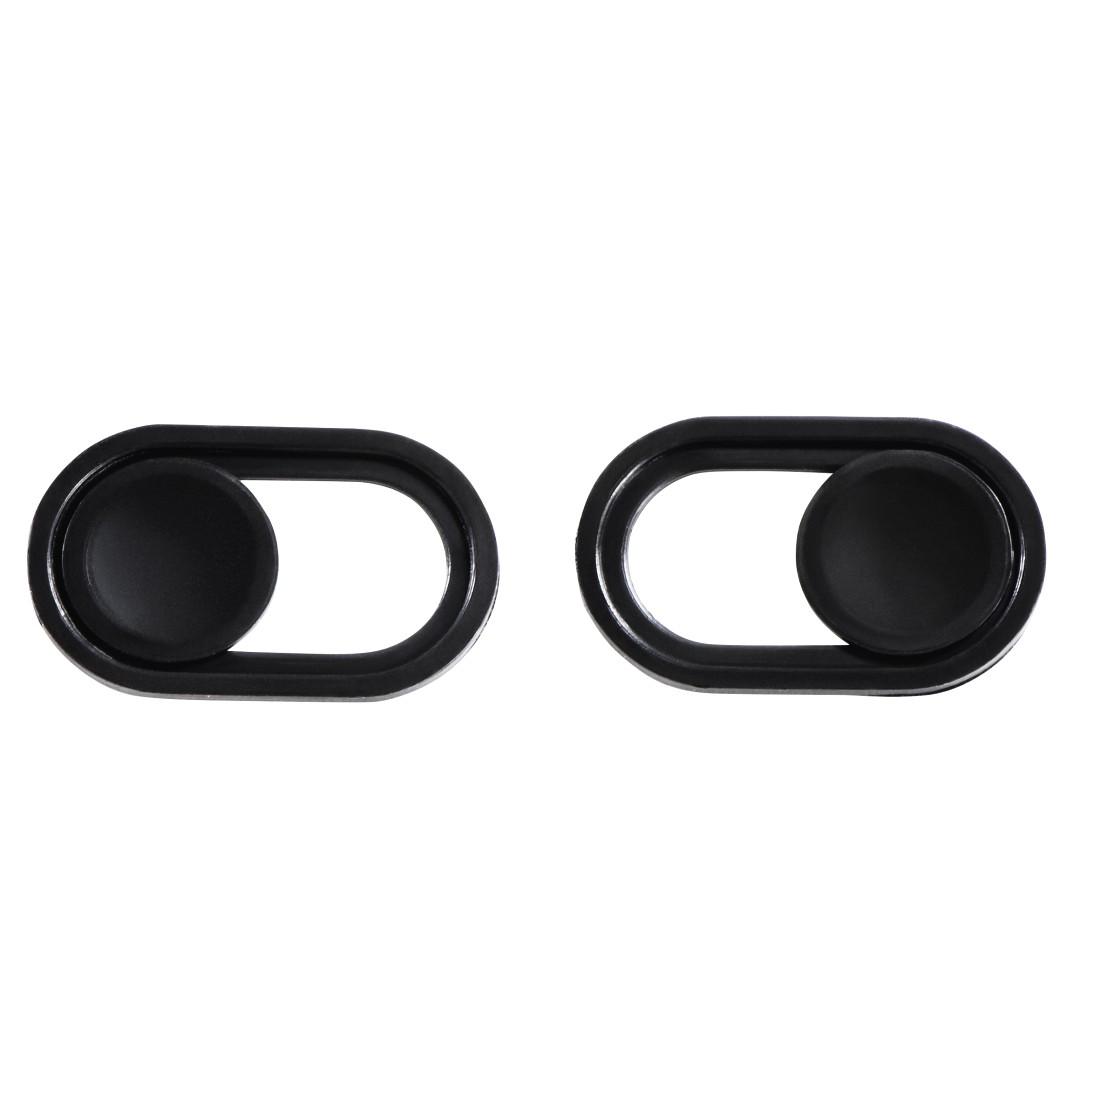 HAMA Double Lens PC Webcam Driver FREE